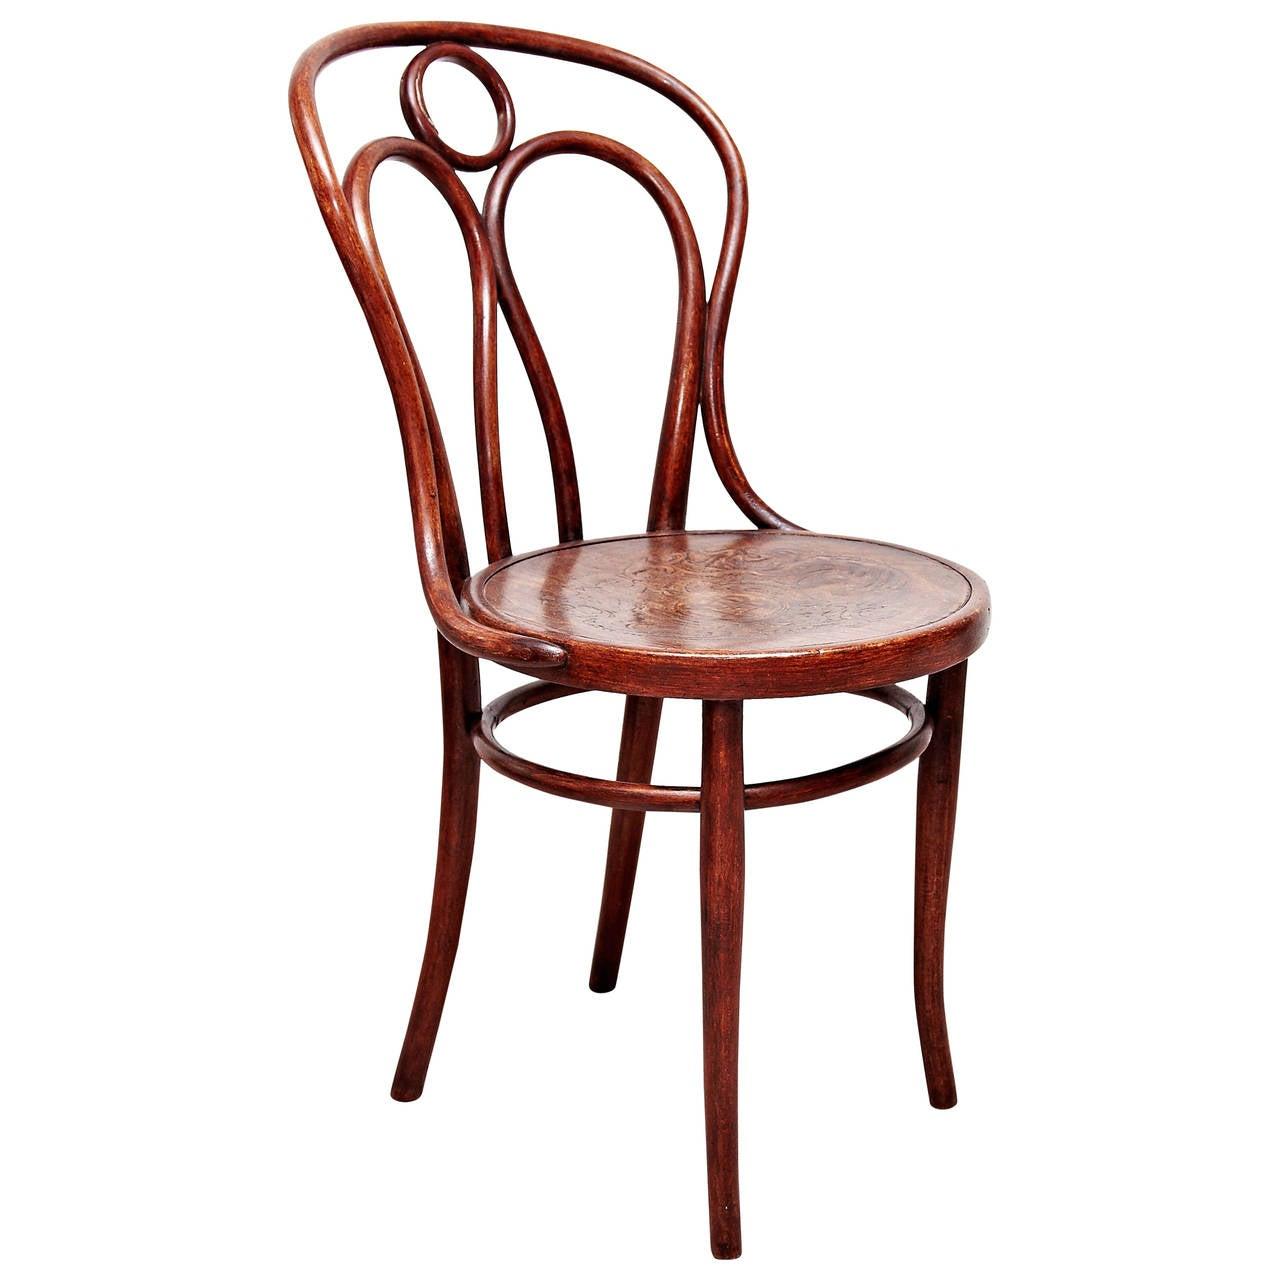 Thonet Chair at 1stdibs